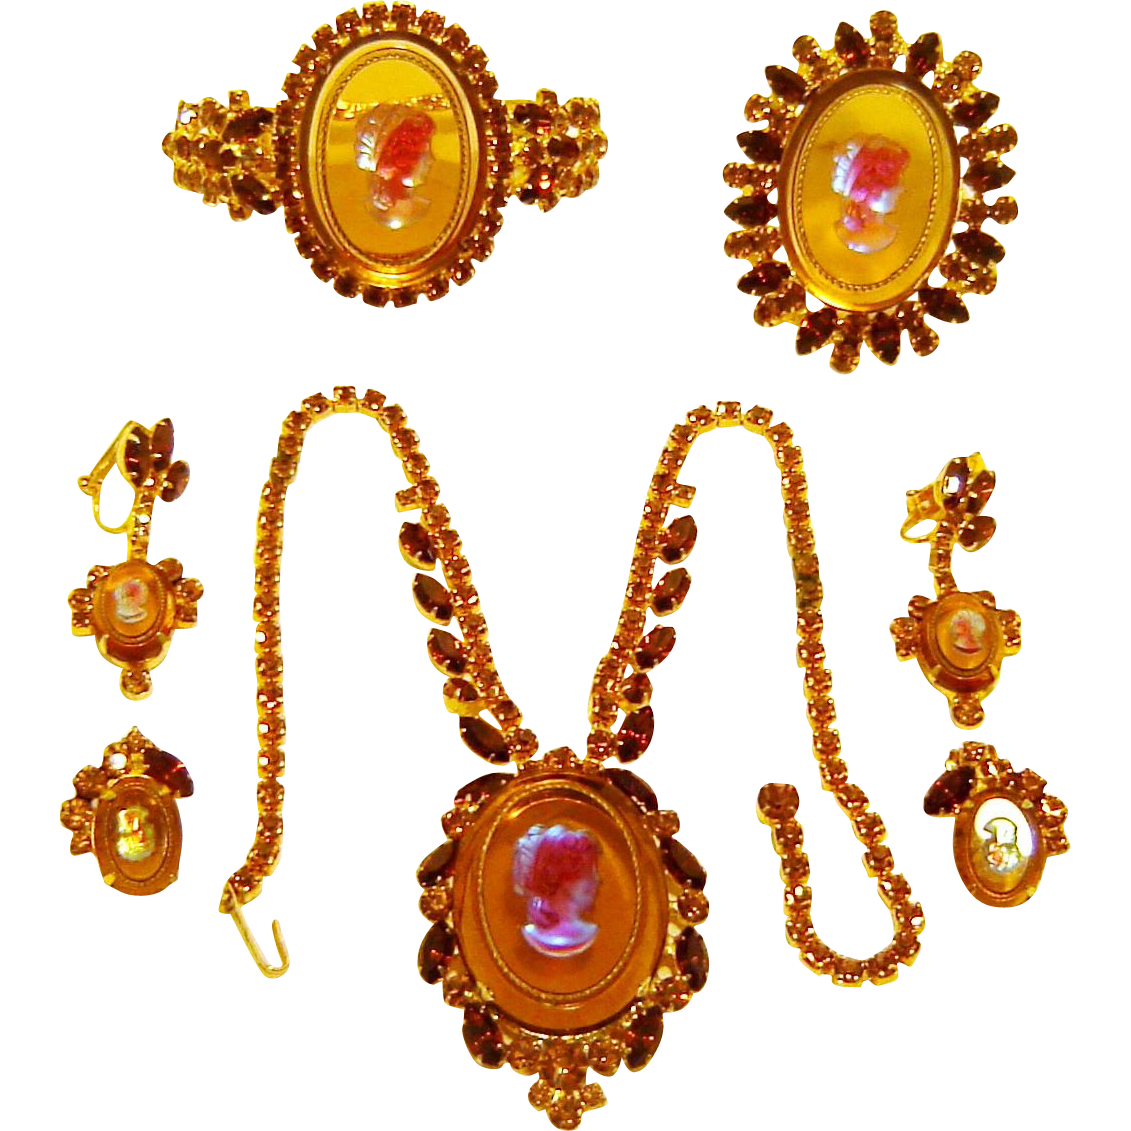 Vintage Juliana Cameo Necklace Clamper Bracelet Brooch Earrings